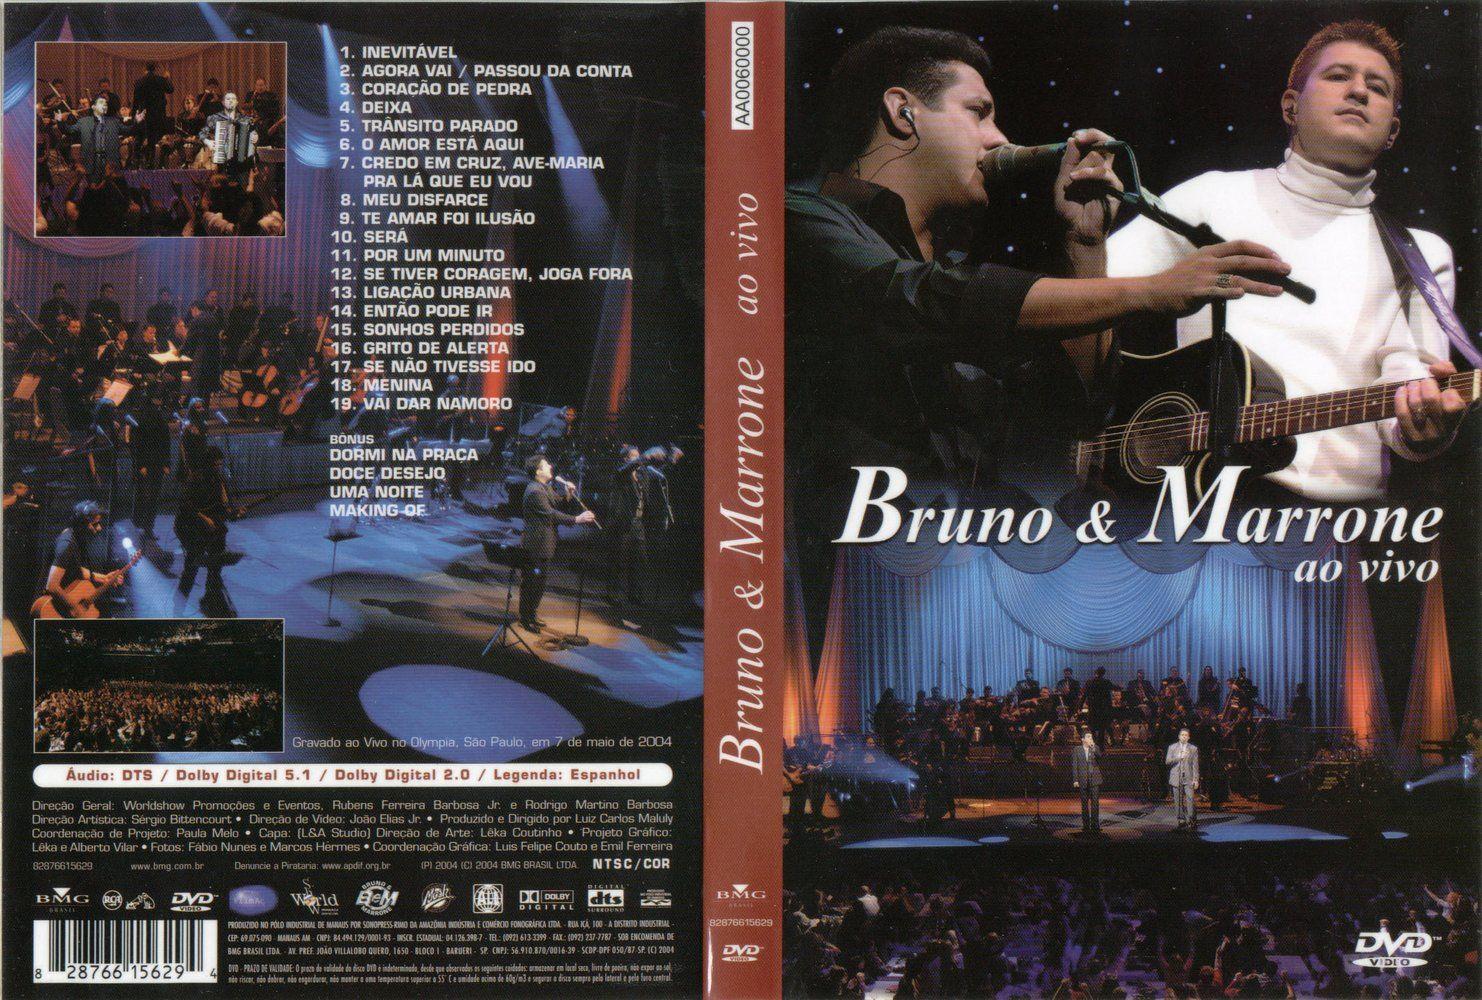 Baixar cd bruno e marrone acustico ao vivo 2000 seventhought.